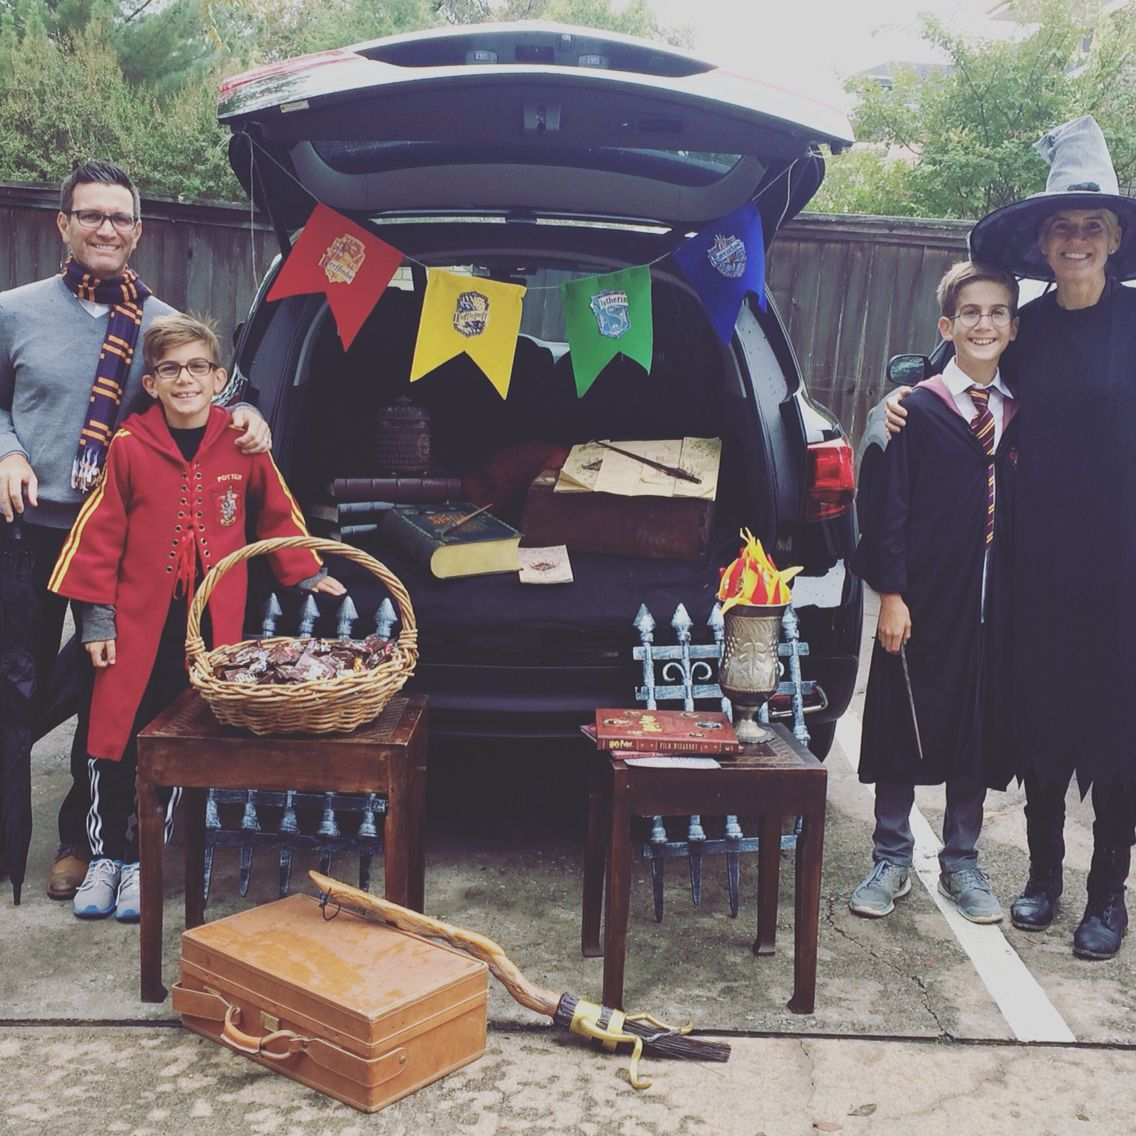 Trunk Halloween Decorating Ideas: Harry Potter Trunk Or Treat